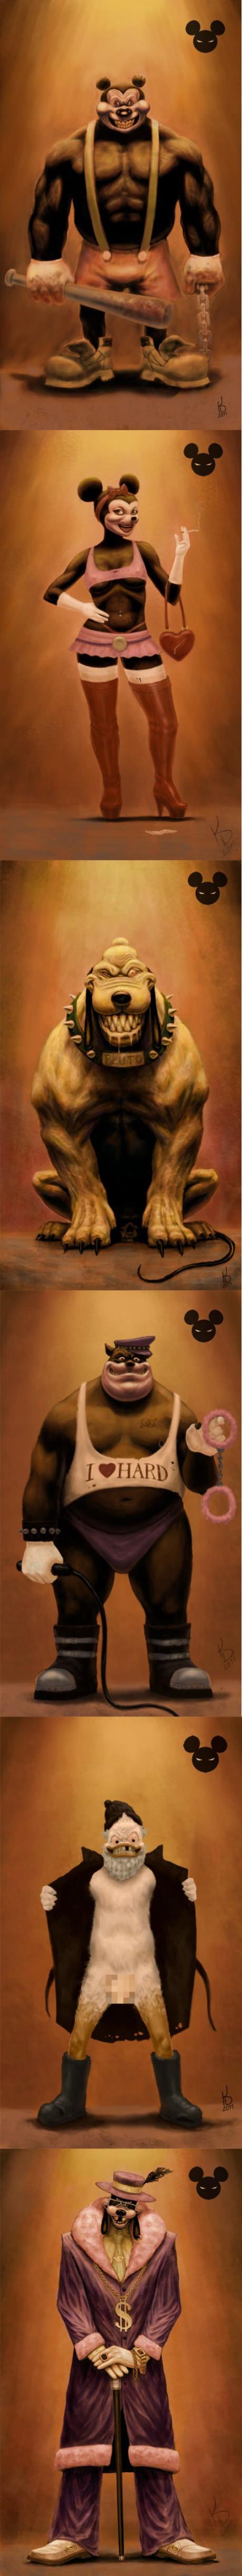 Disney Characters Reimagined. .. It's Goofizzle. Disney Characters Reimagined It's Goofizzle